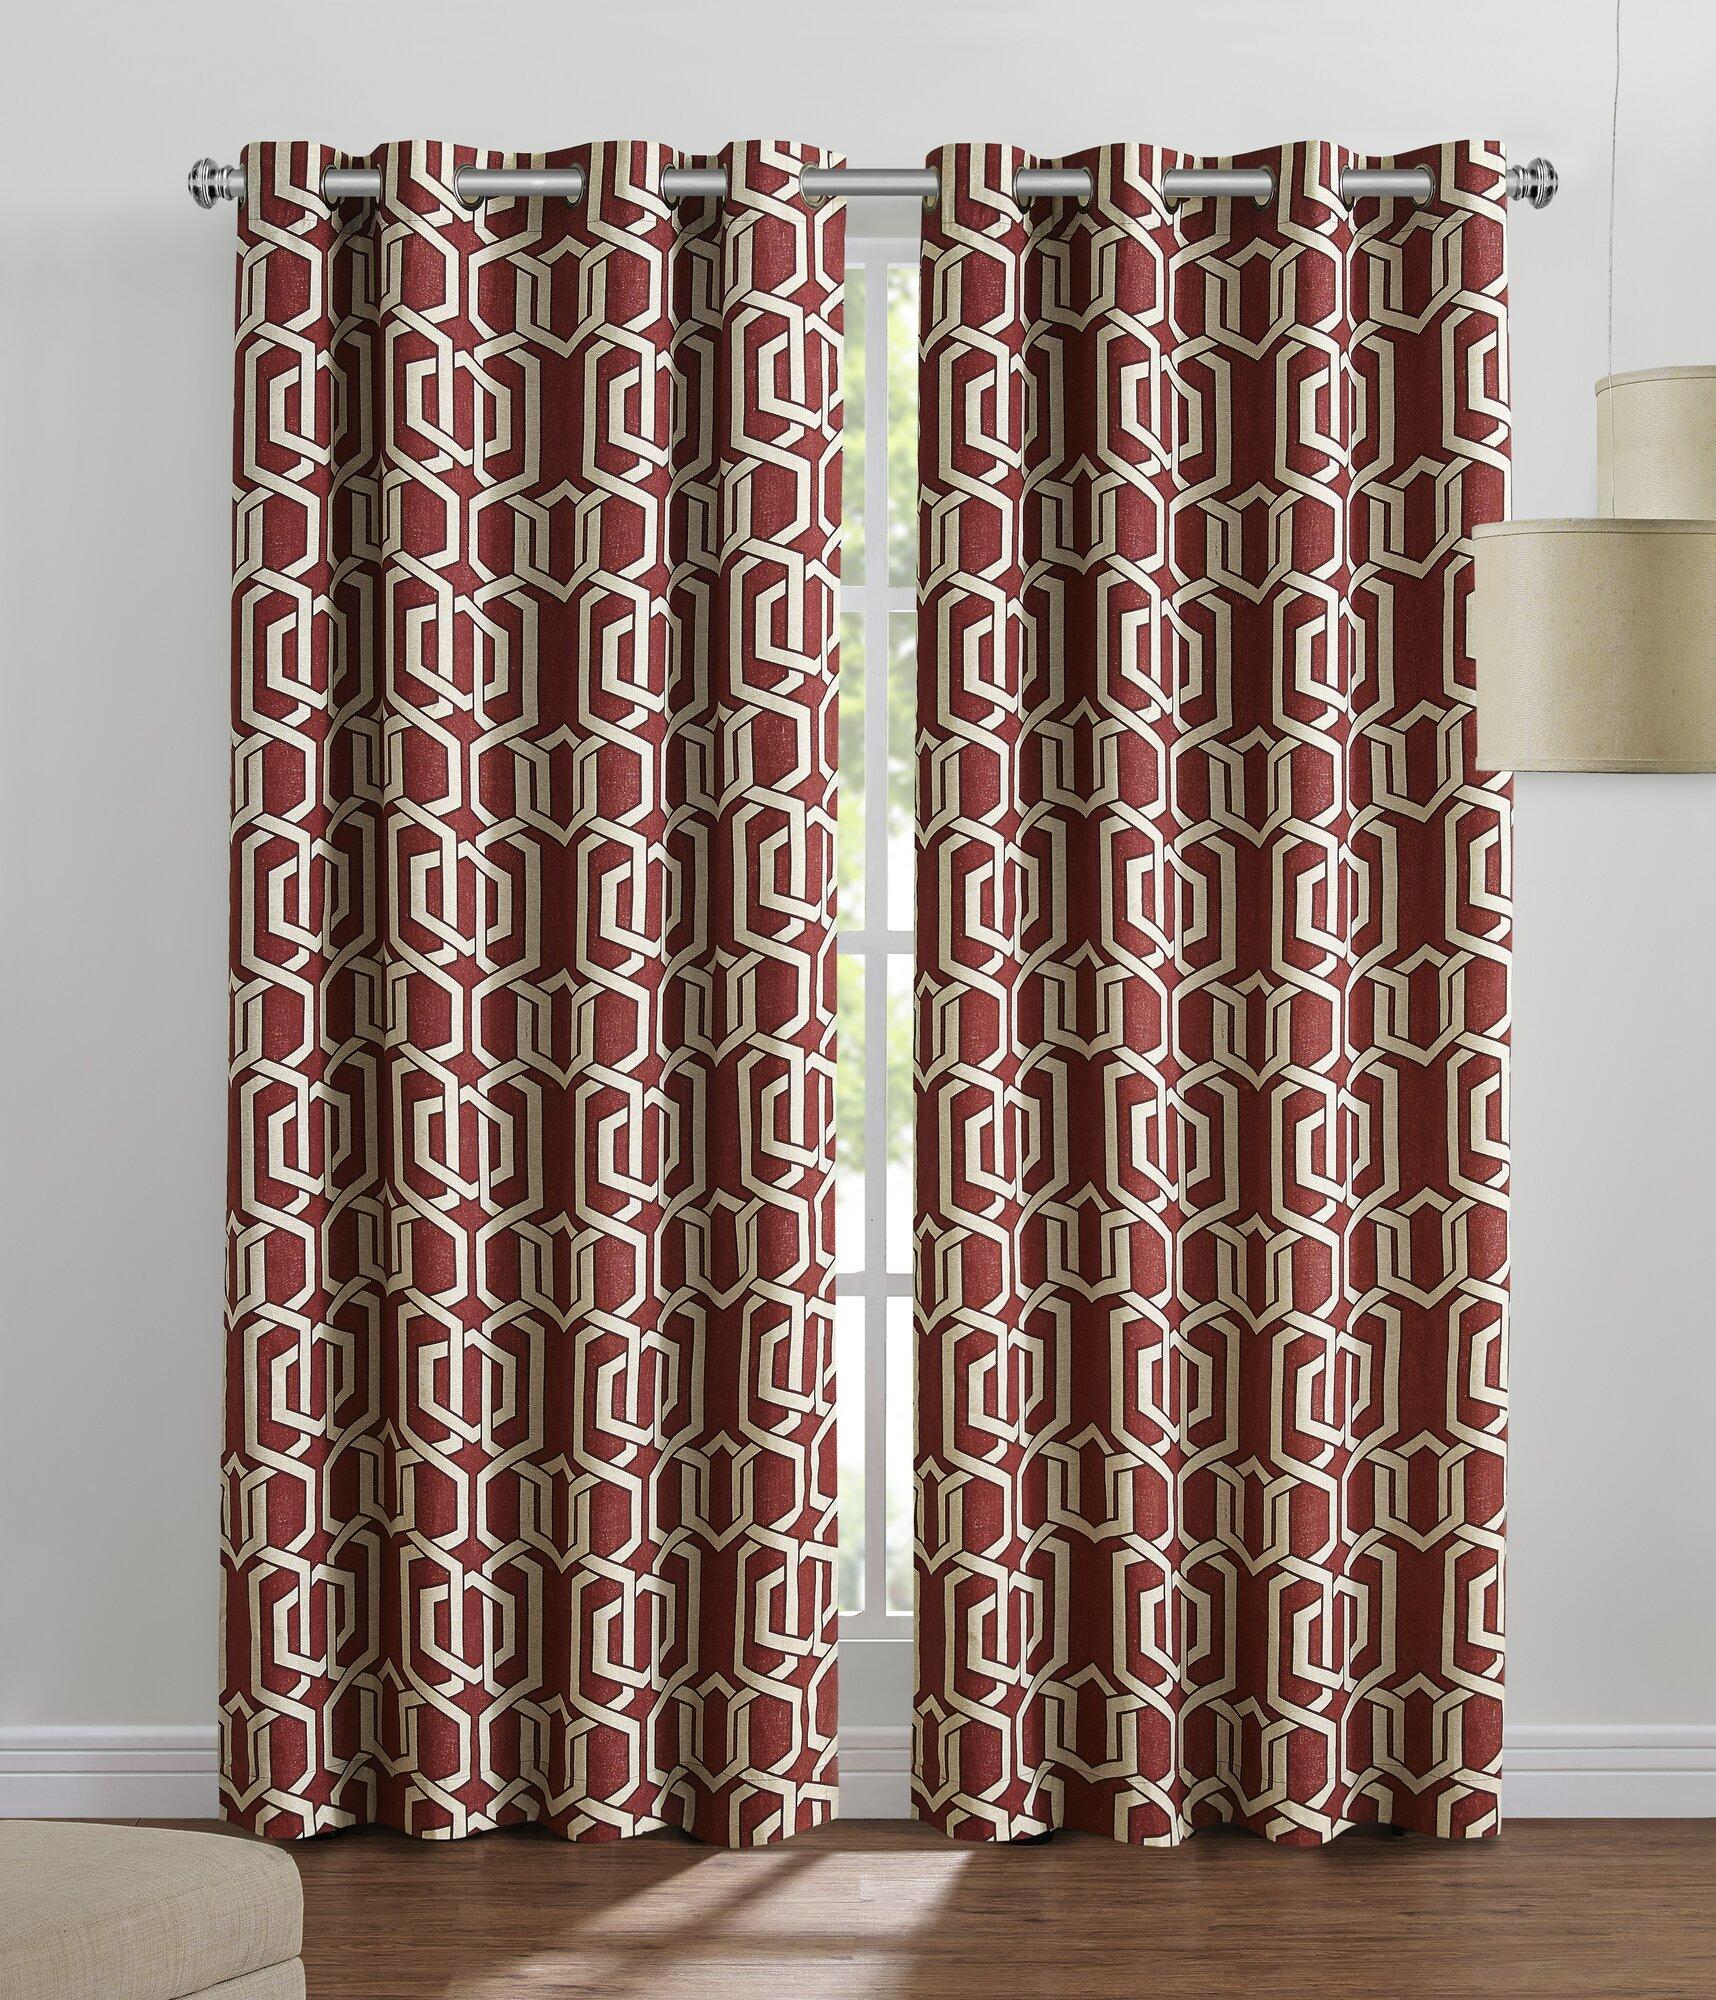 Richloom Home Fashions Metropolitan IndoorOutdoor Single